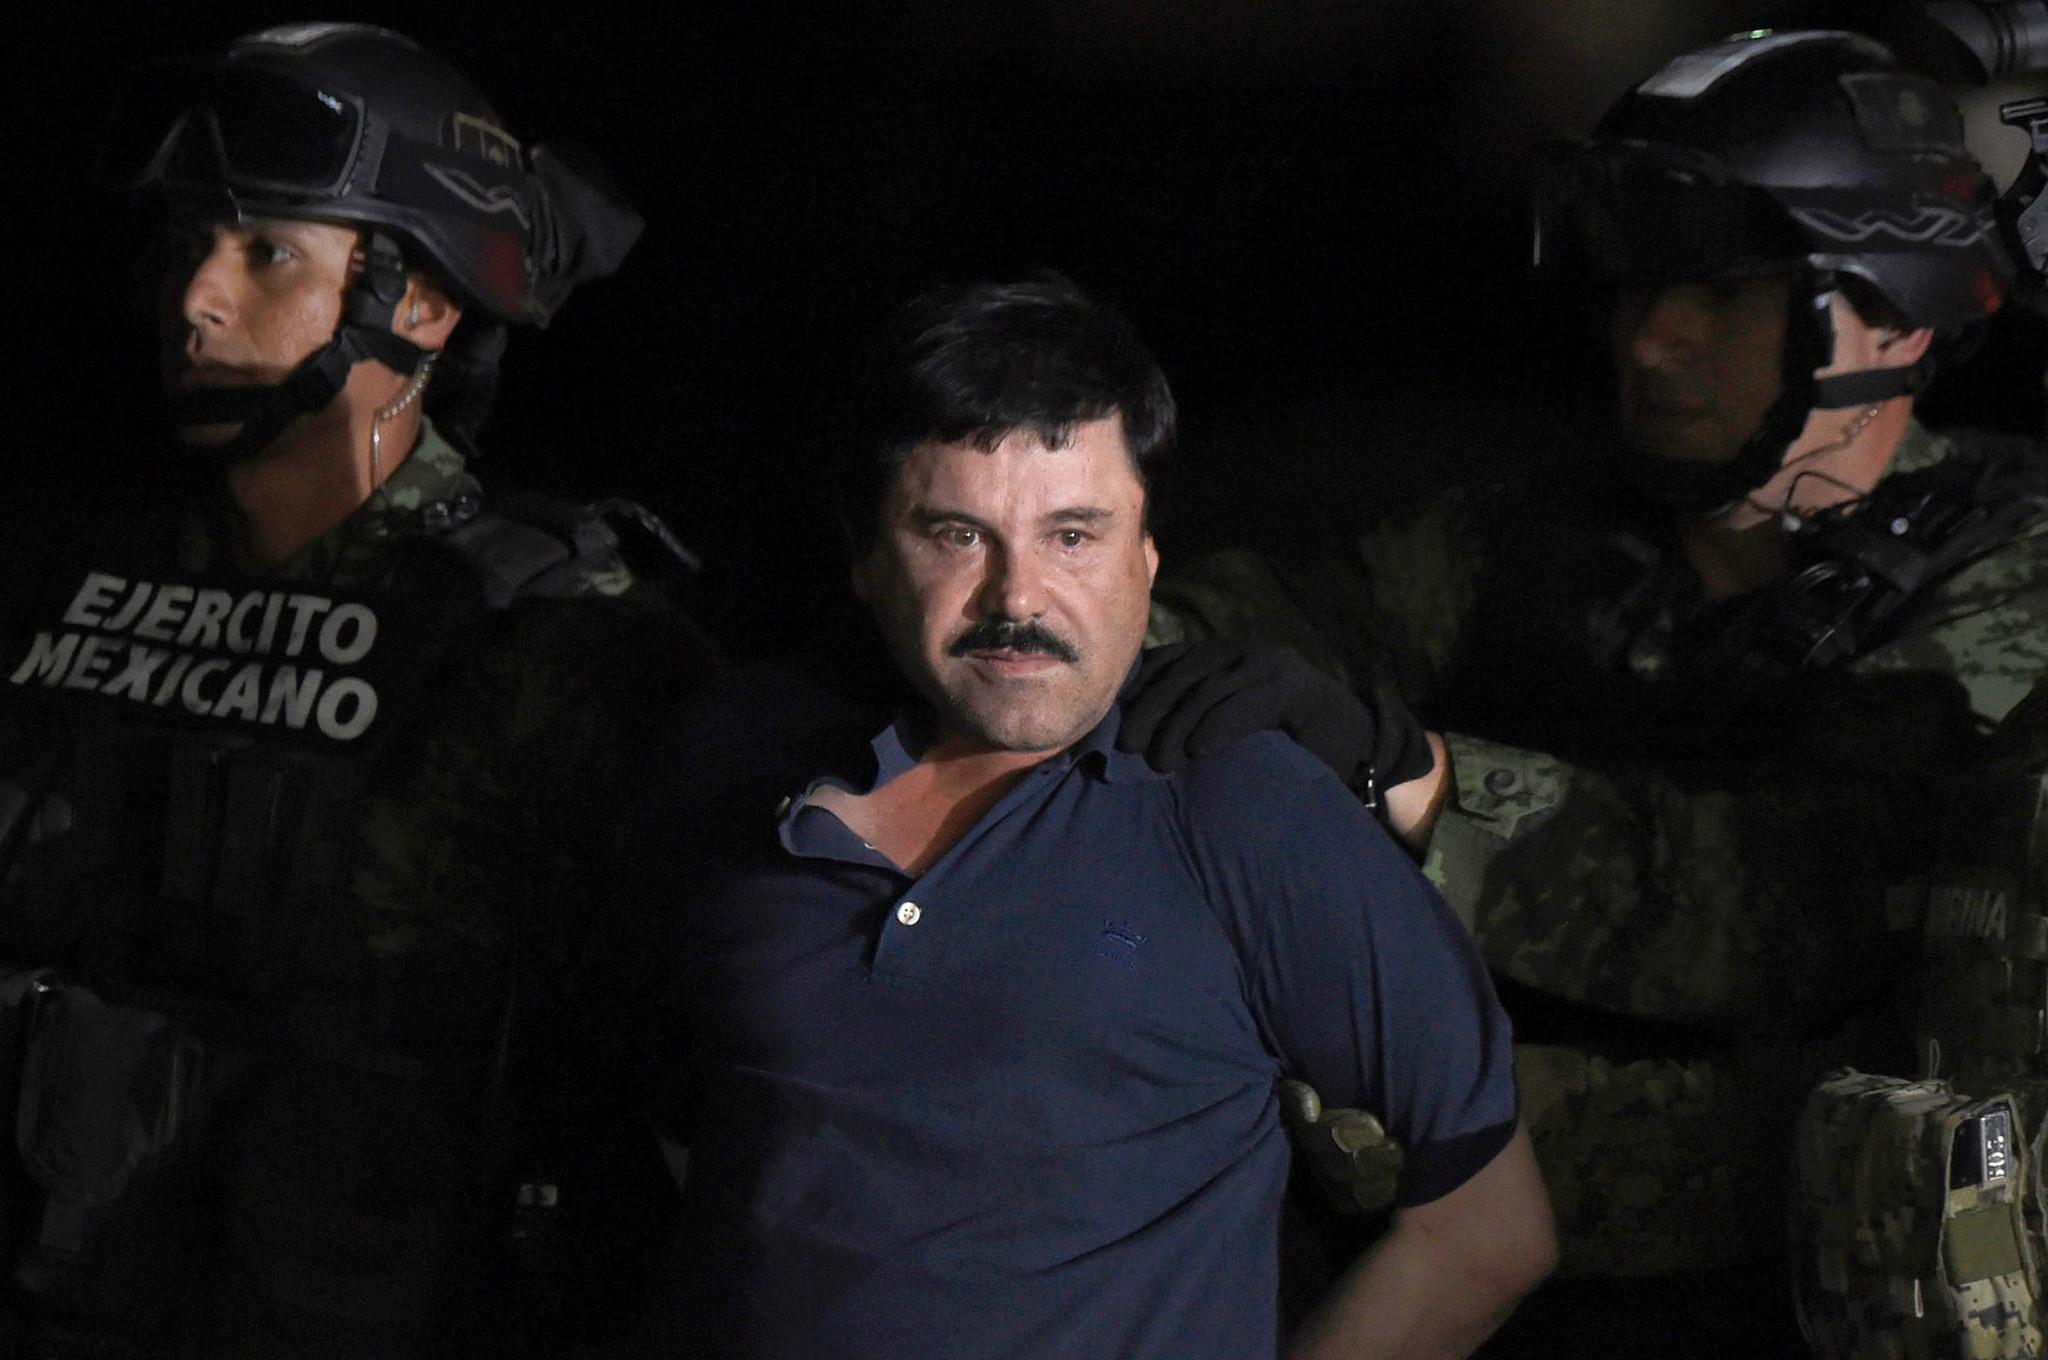 u0026 39 el chapo u0026 39  money launderer gets 8 years in prison